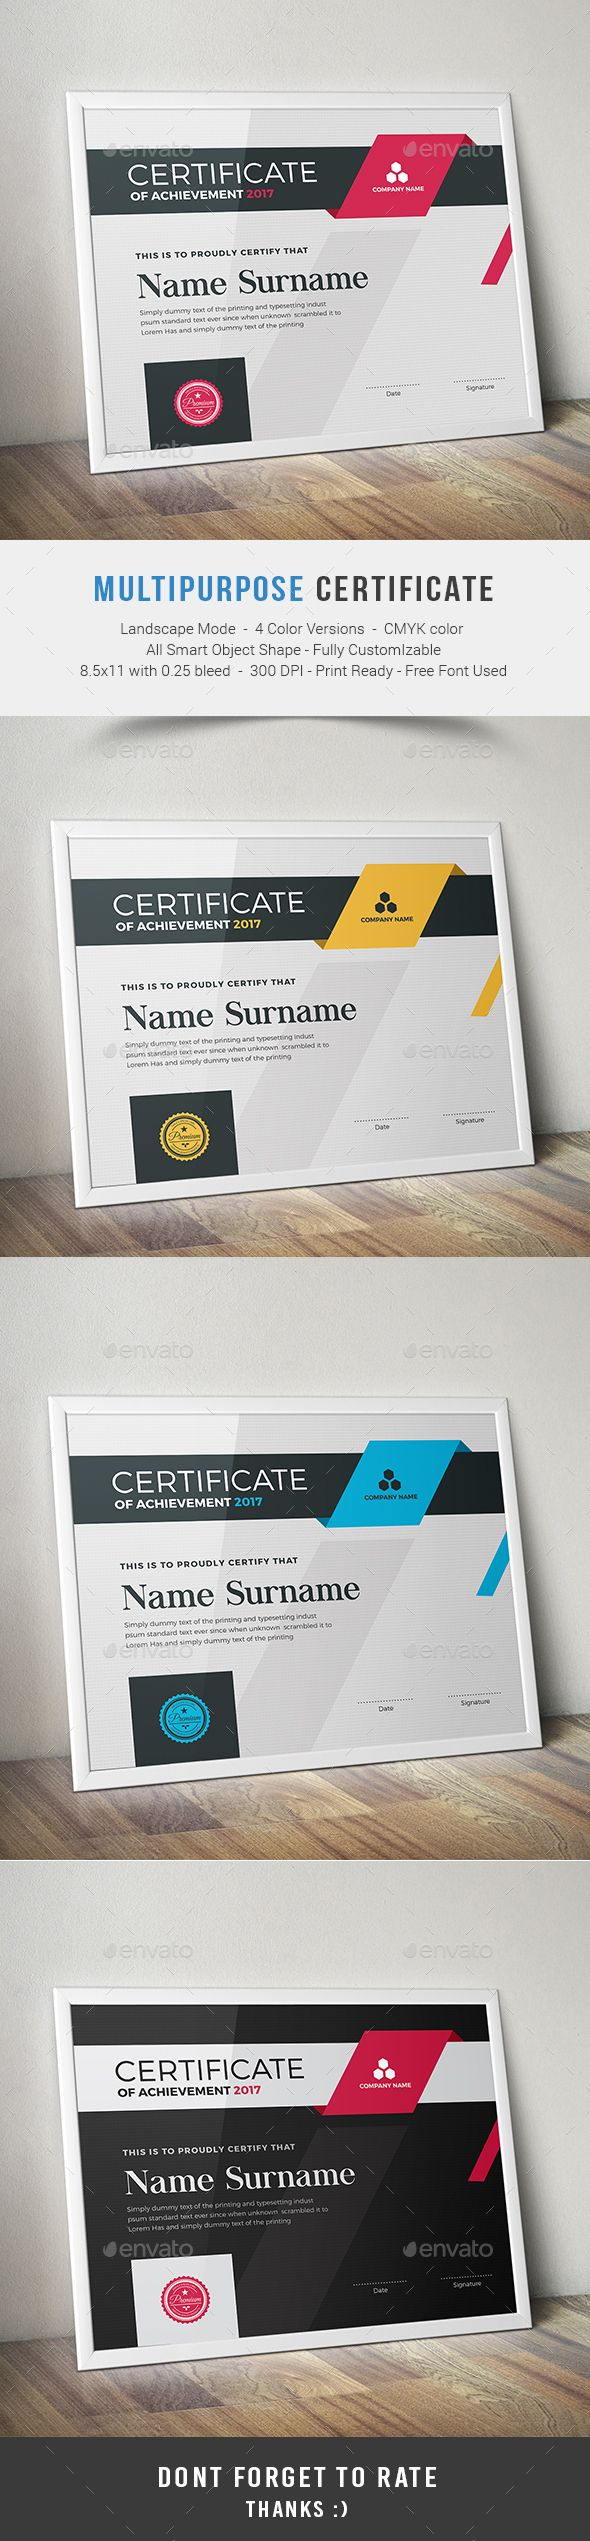 Multipurpose Certificates Template PSD. Download here: http://graphicriver.net/item/multipurpose-certificates/16063617?ref=ksioks